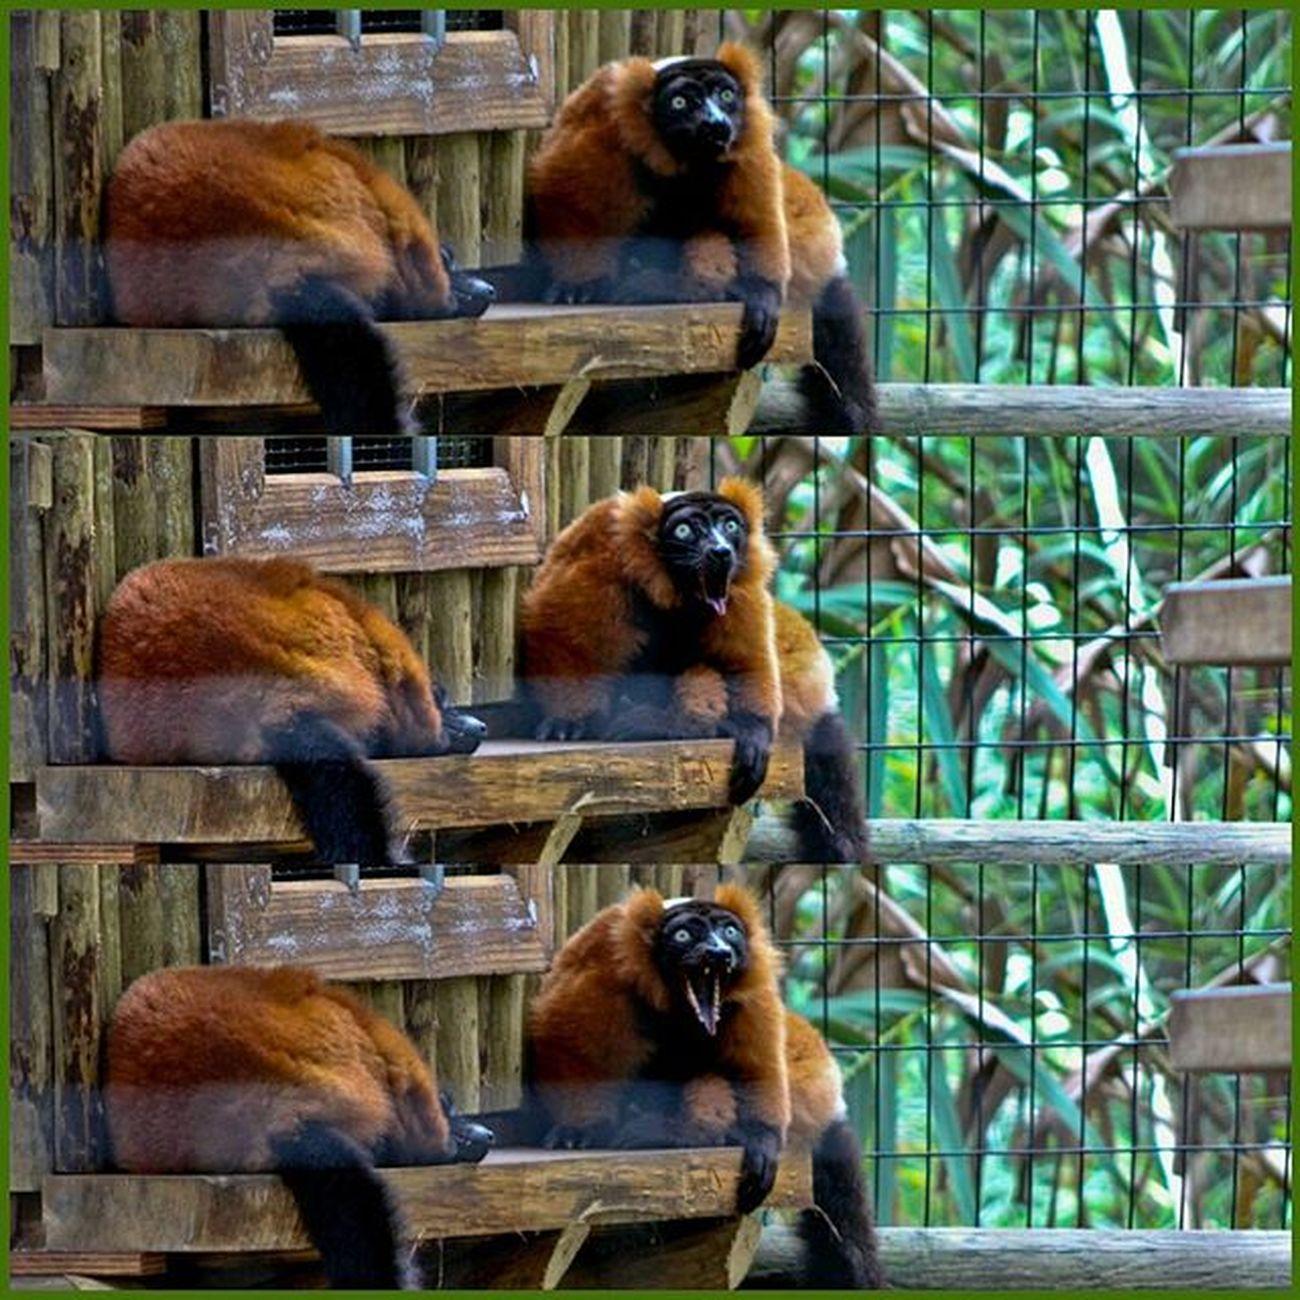 Red ruffed Lemur reacting @staugalligatorfarm Redruffedlemur Lemur Grill Smile Animals Mammals Nature Naturelovers Instagood Igersjax Igersstaugustine IlovesStAugustine Picoftheday Pureflorida Ig_great_pics Roamflorida 904skyporn Eyesofjax Onlyinduval Voidlive Staugustine Florida Canon